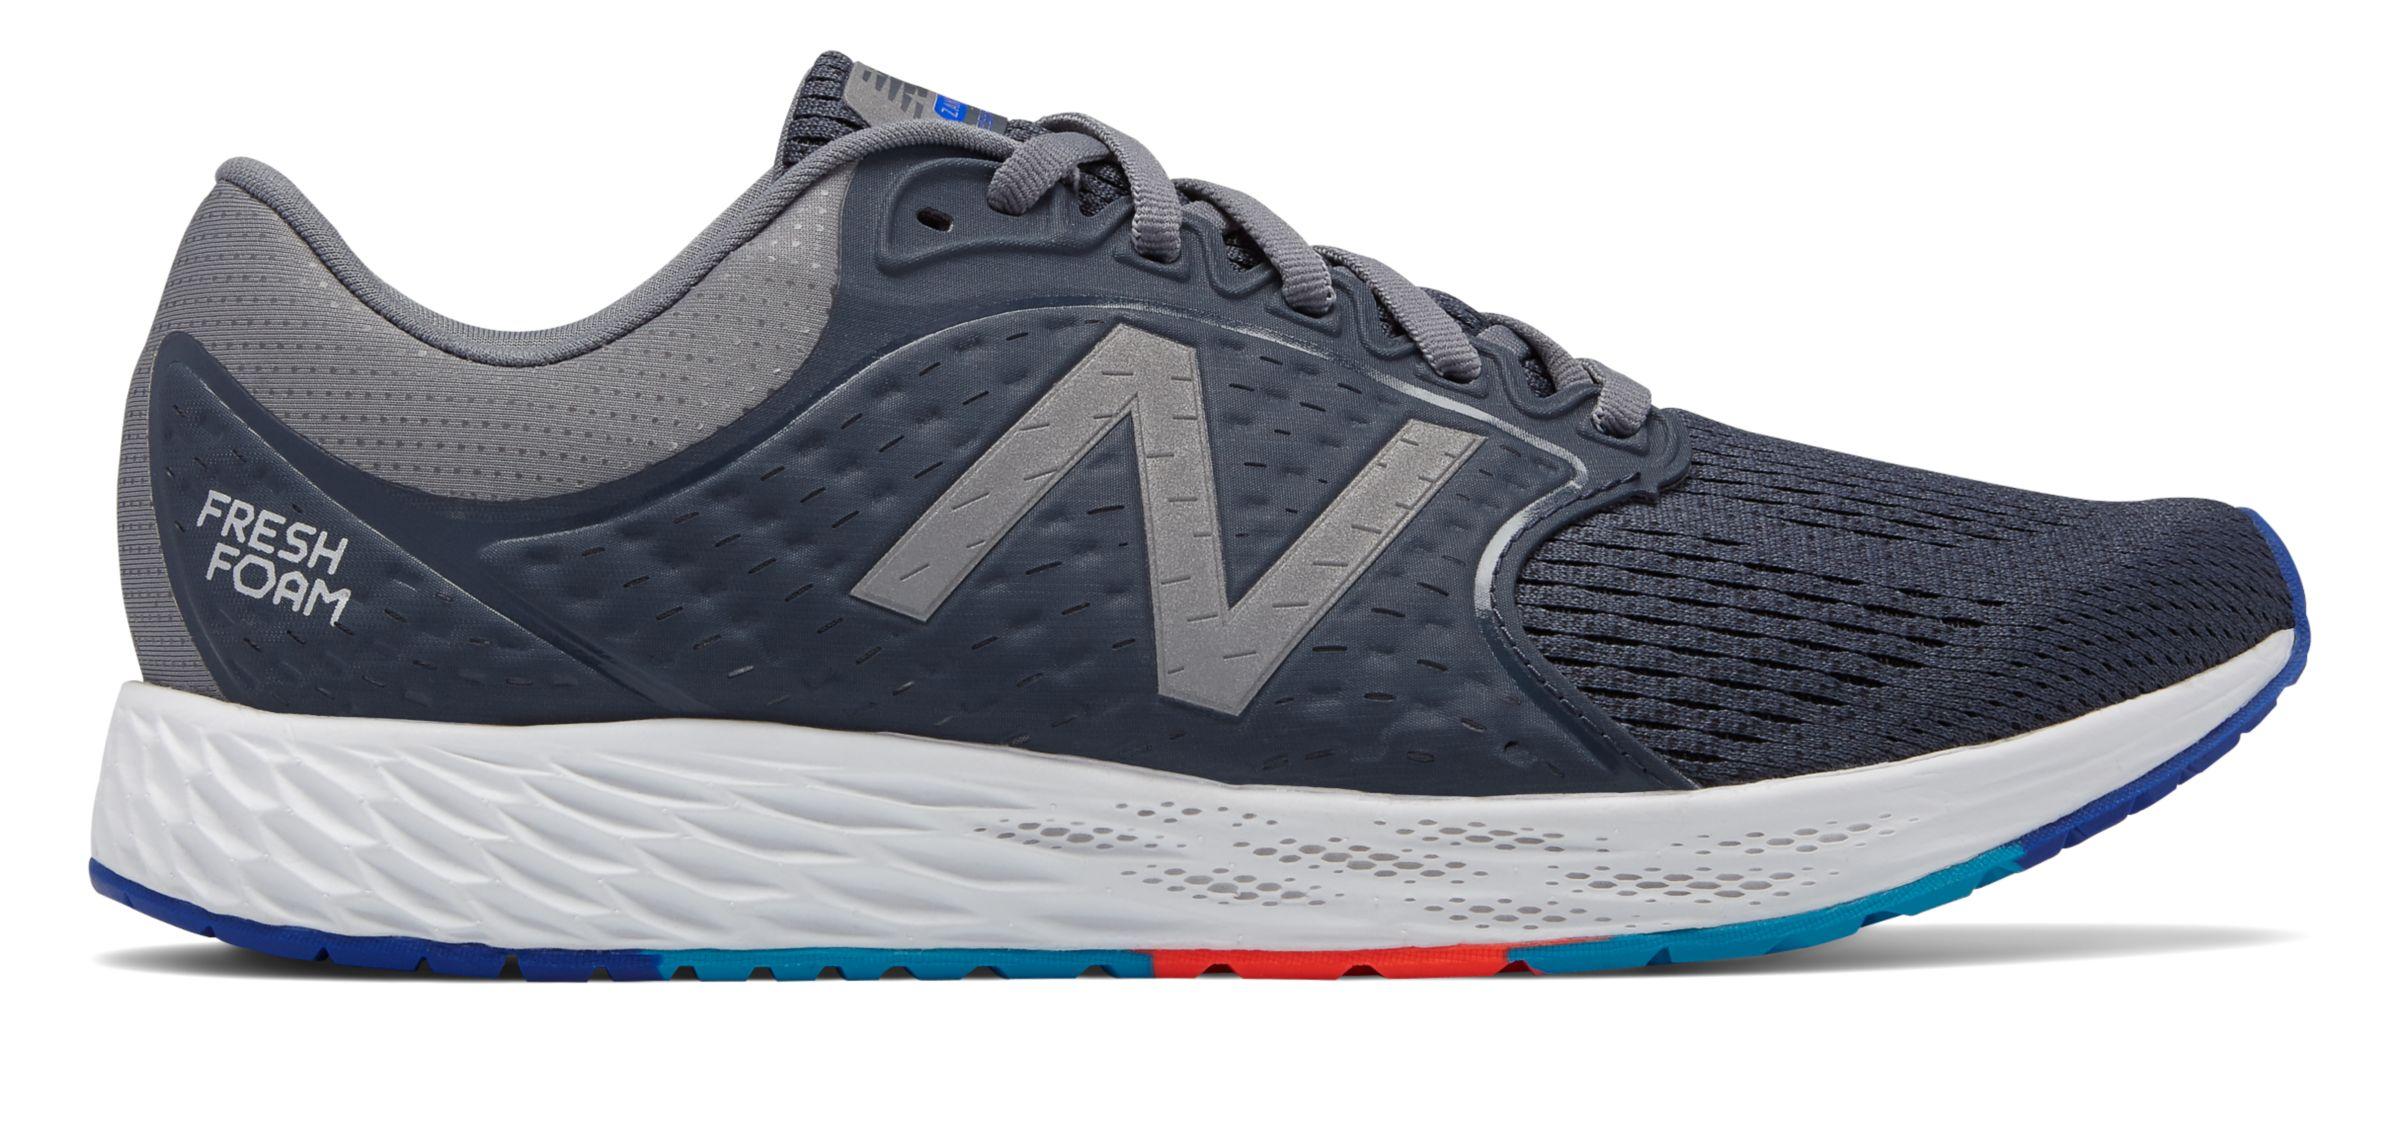 New Balance Men s Fresh Foam Zante v4 Shoes Grey with Grey  4a6899bfb7